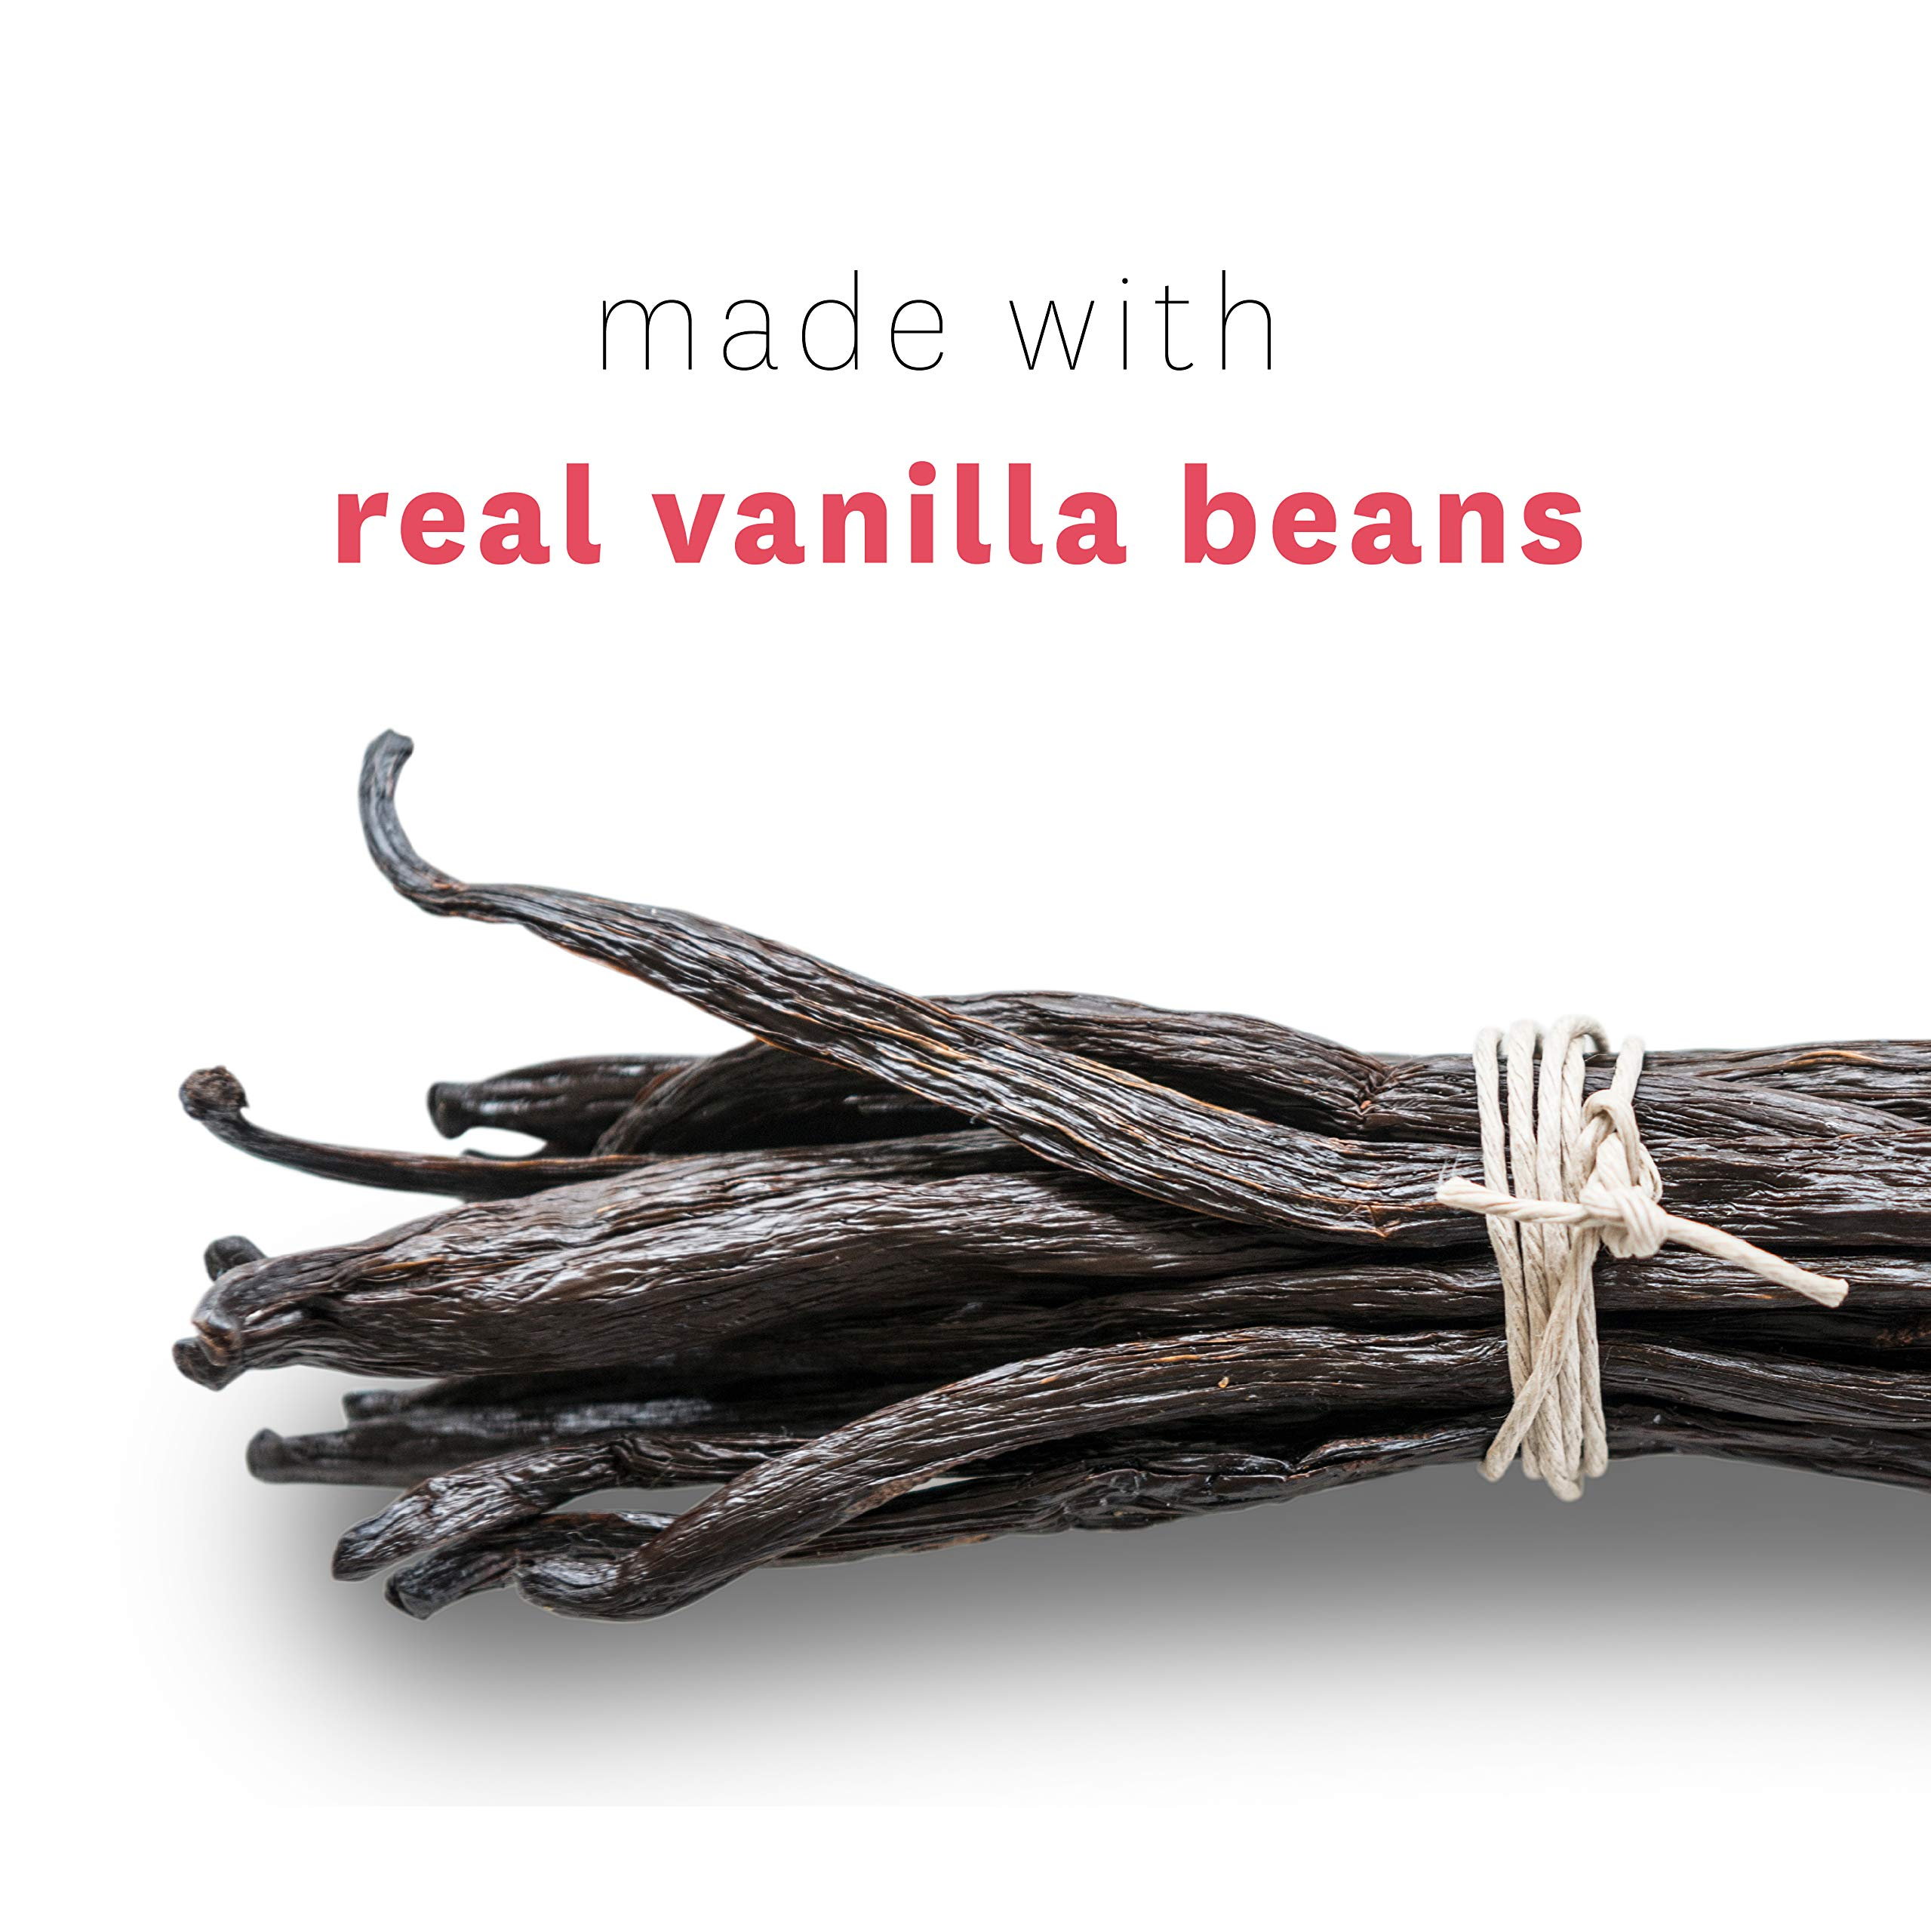 Heilala Vanilla Syrup - Premium Vanilla Bean Syrup Flavoring for Coffee, Cocktails, Pancakes, Ice Cream, 16.90 fl oz by Heilala Vanilla (Image #3)